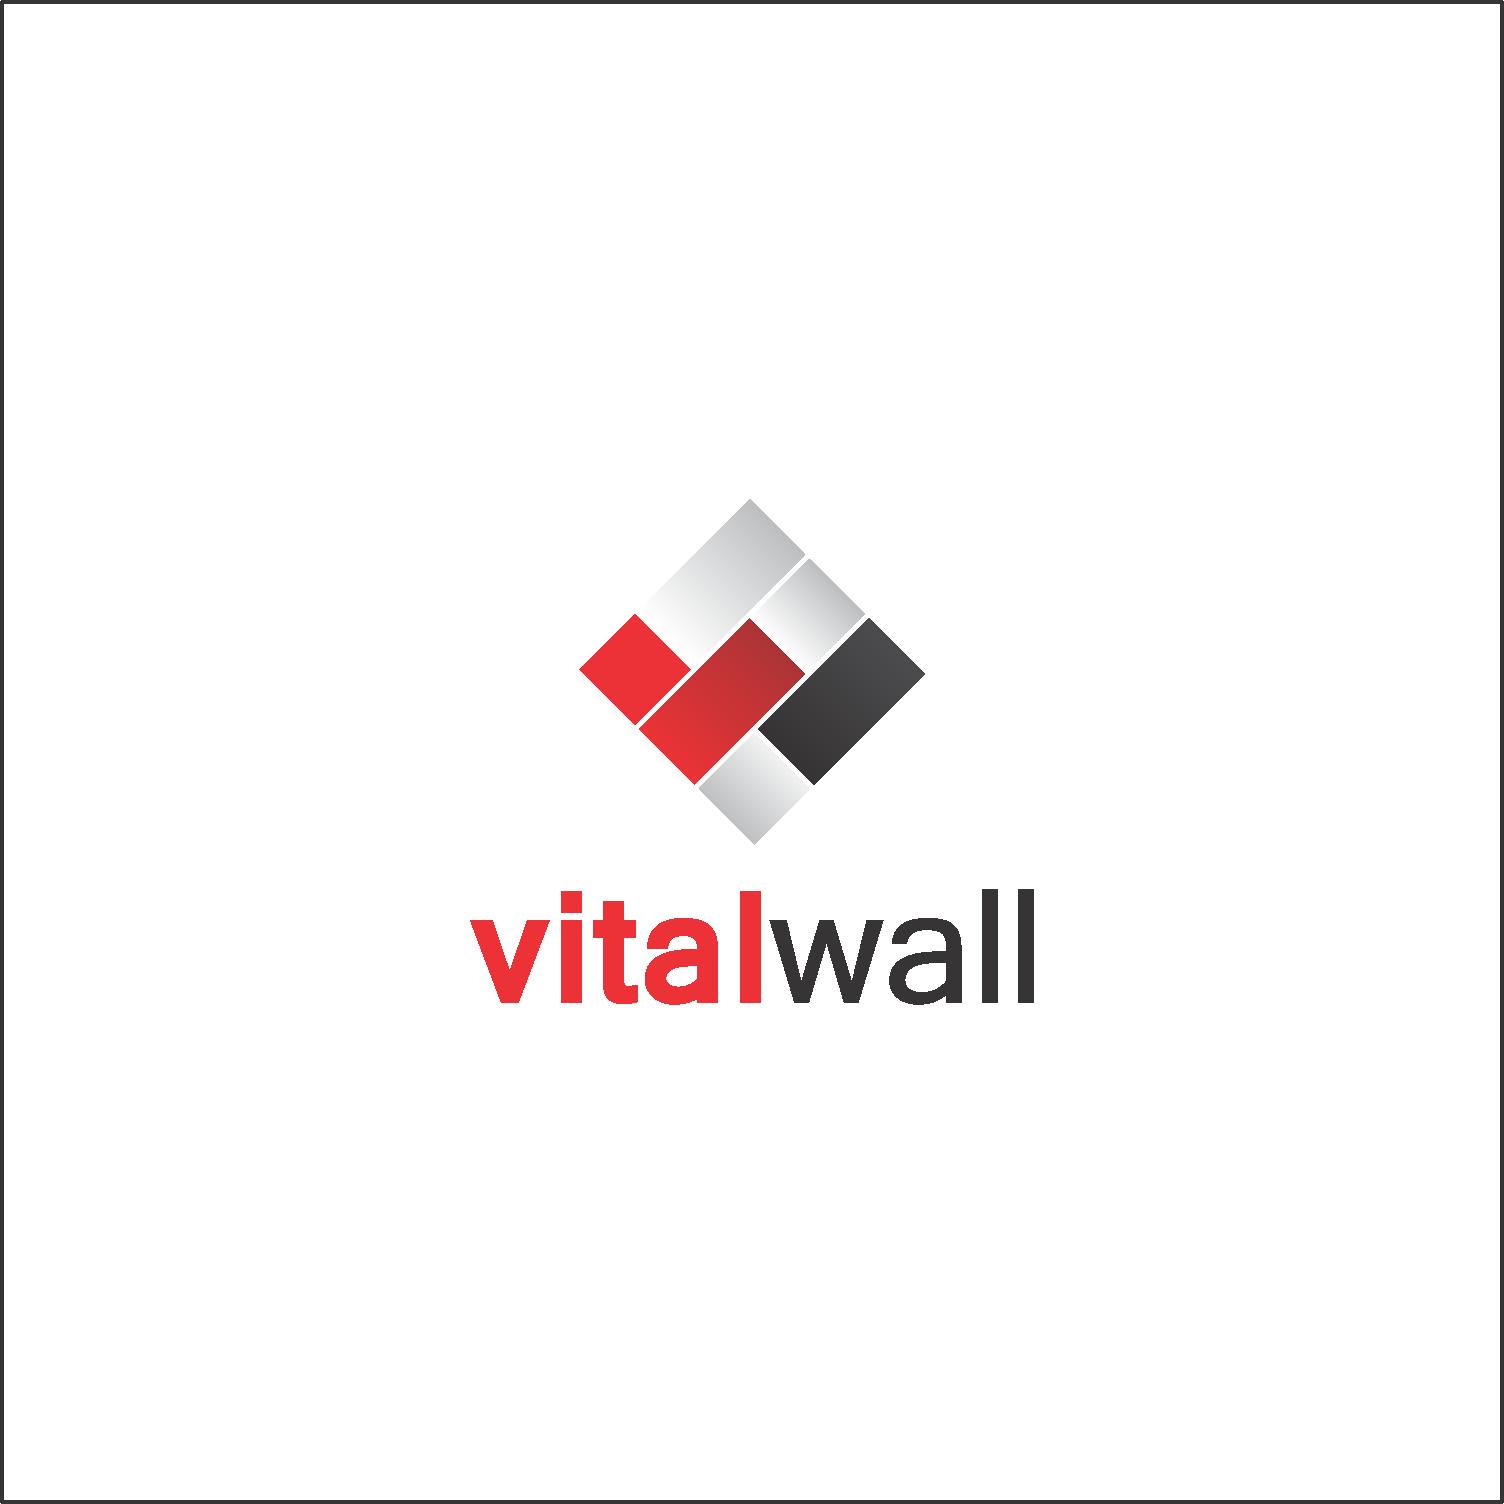 New Online Analytics Platform needs a powerful logo